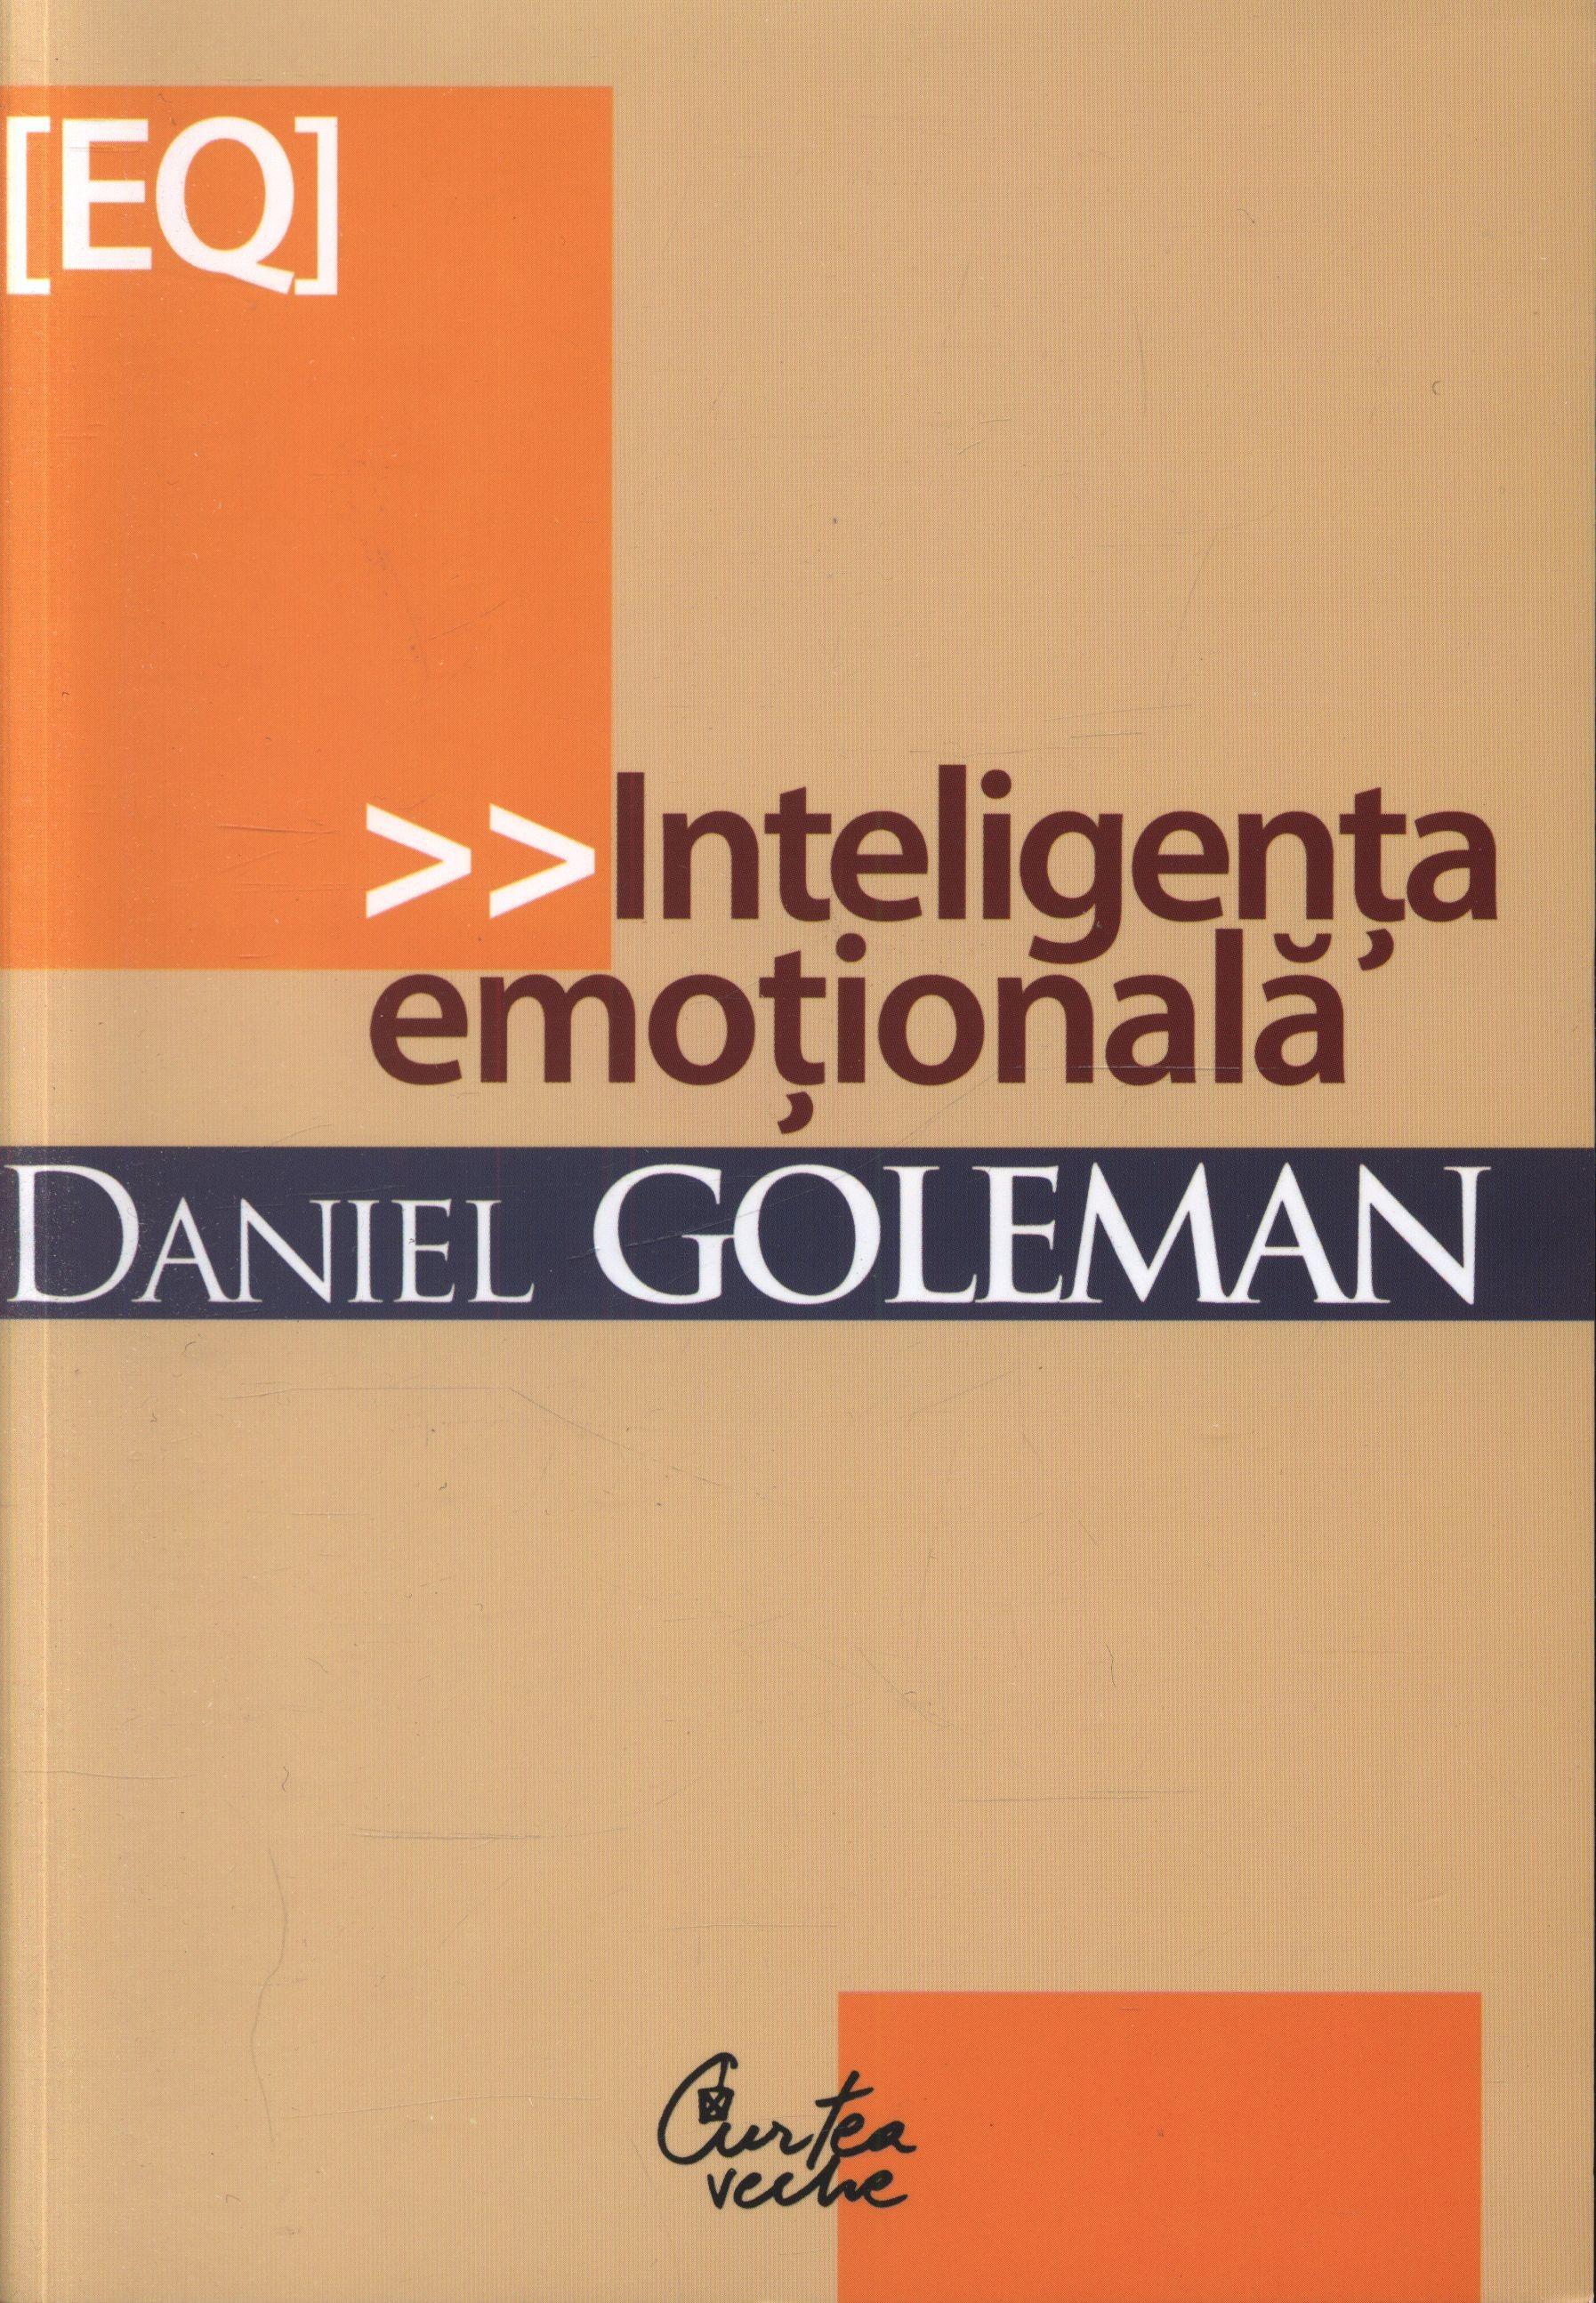 Daniel Goleman - Inteligenta emotionala. Editia a III-a -